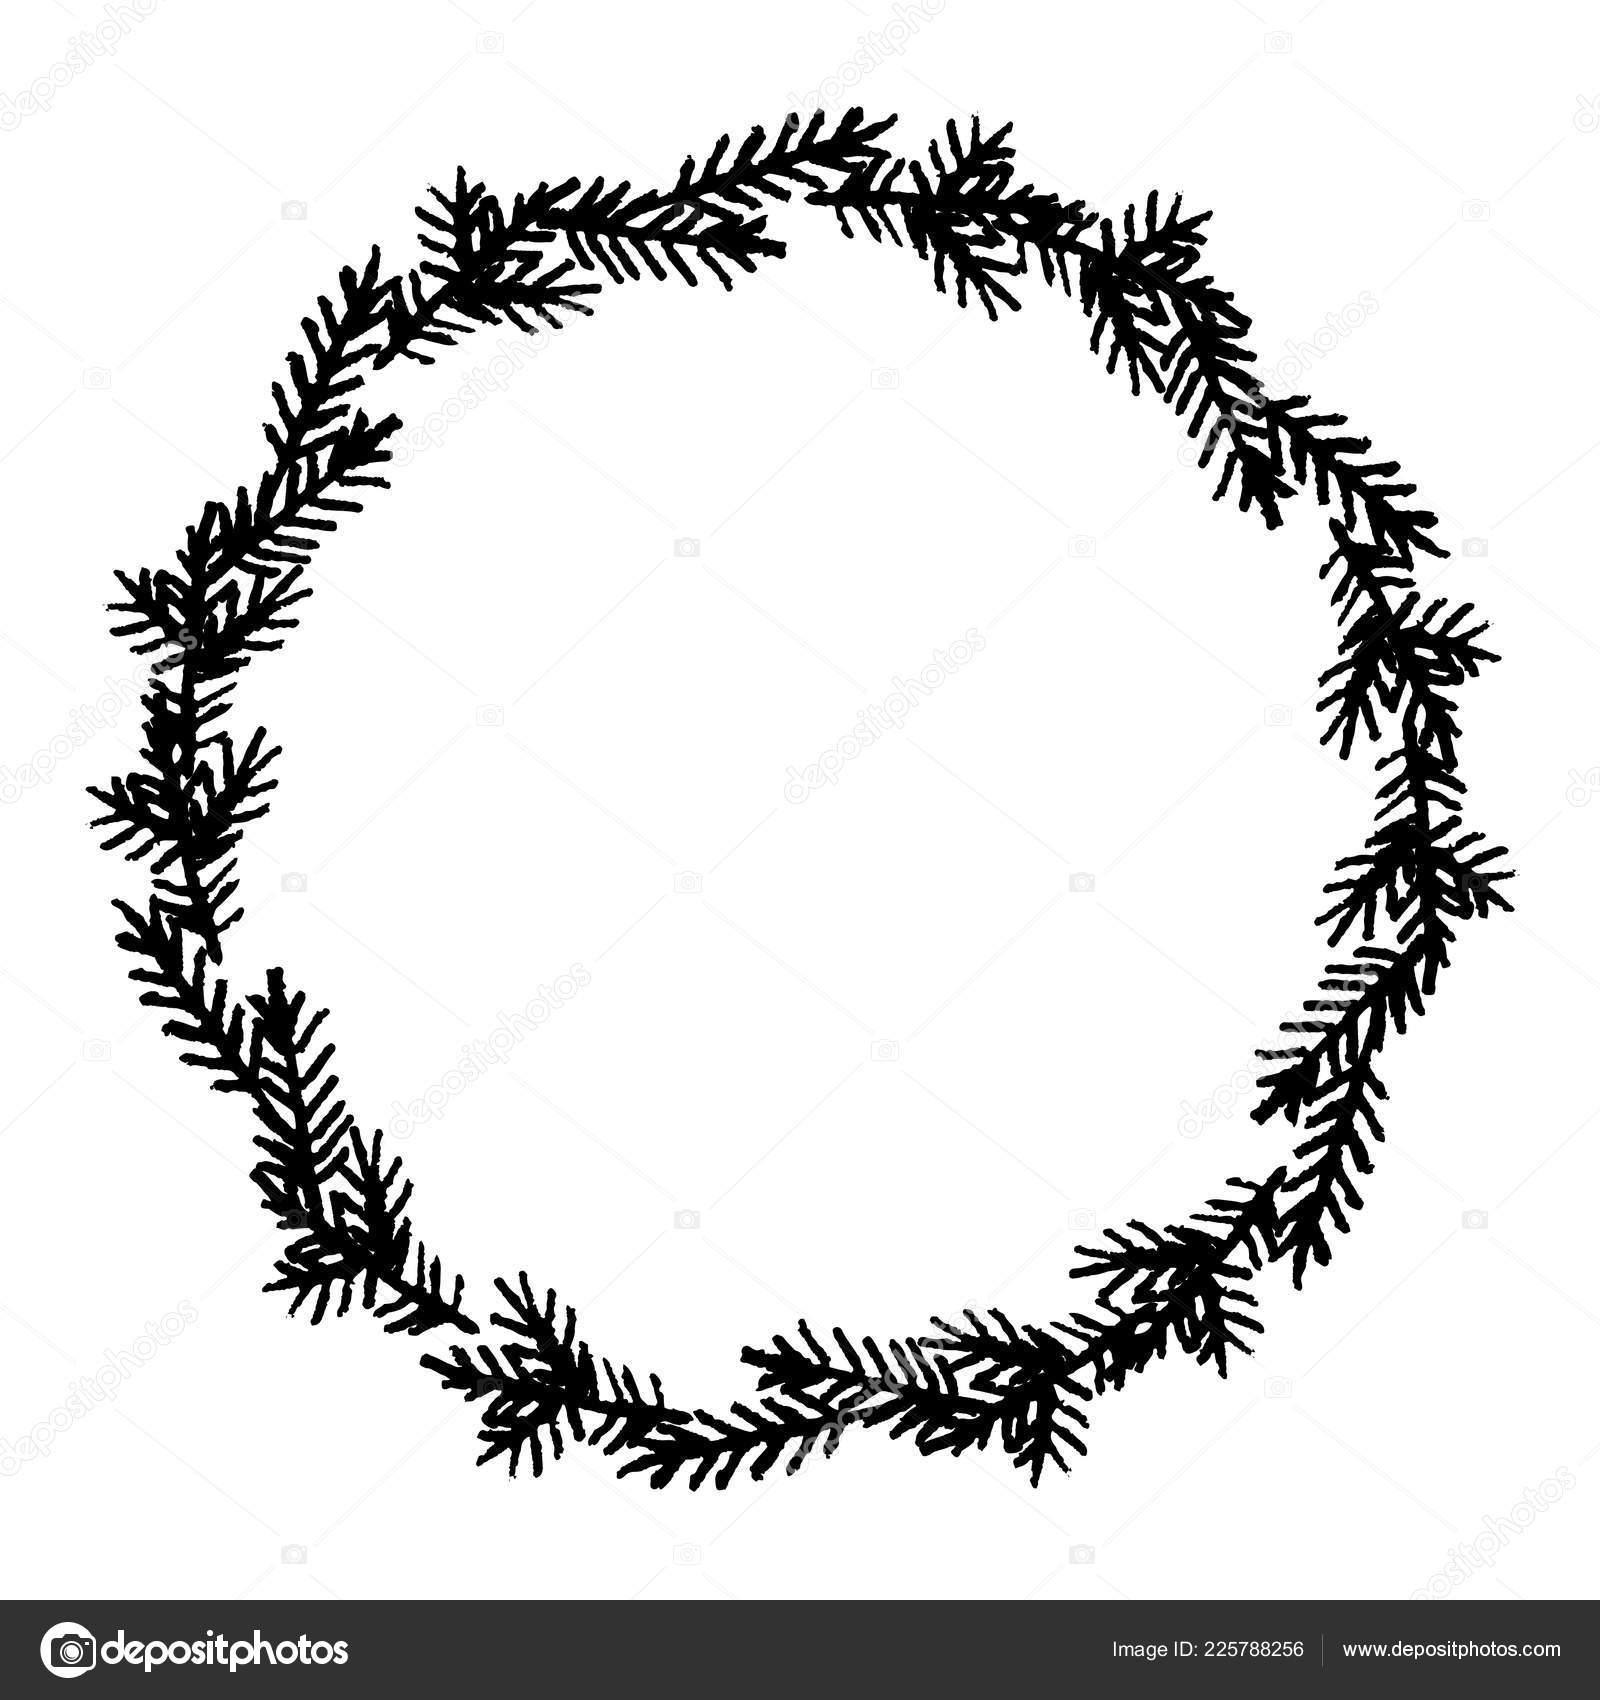 Декор для круглого зеркала своими руками